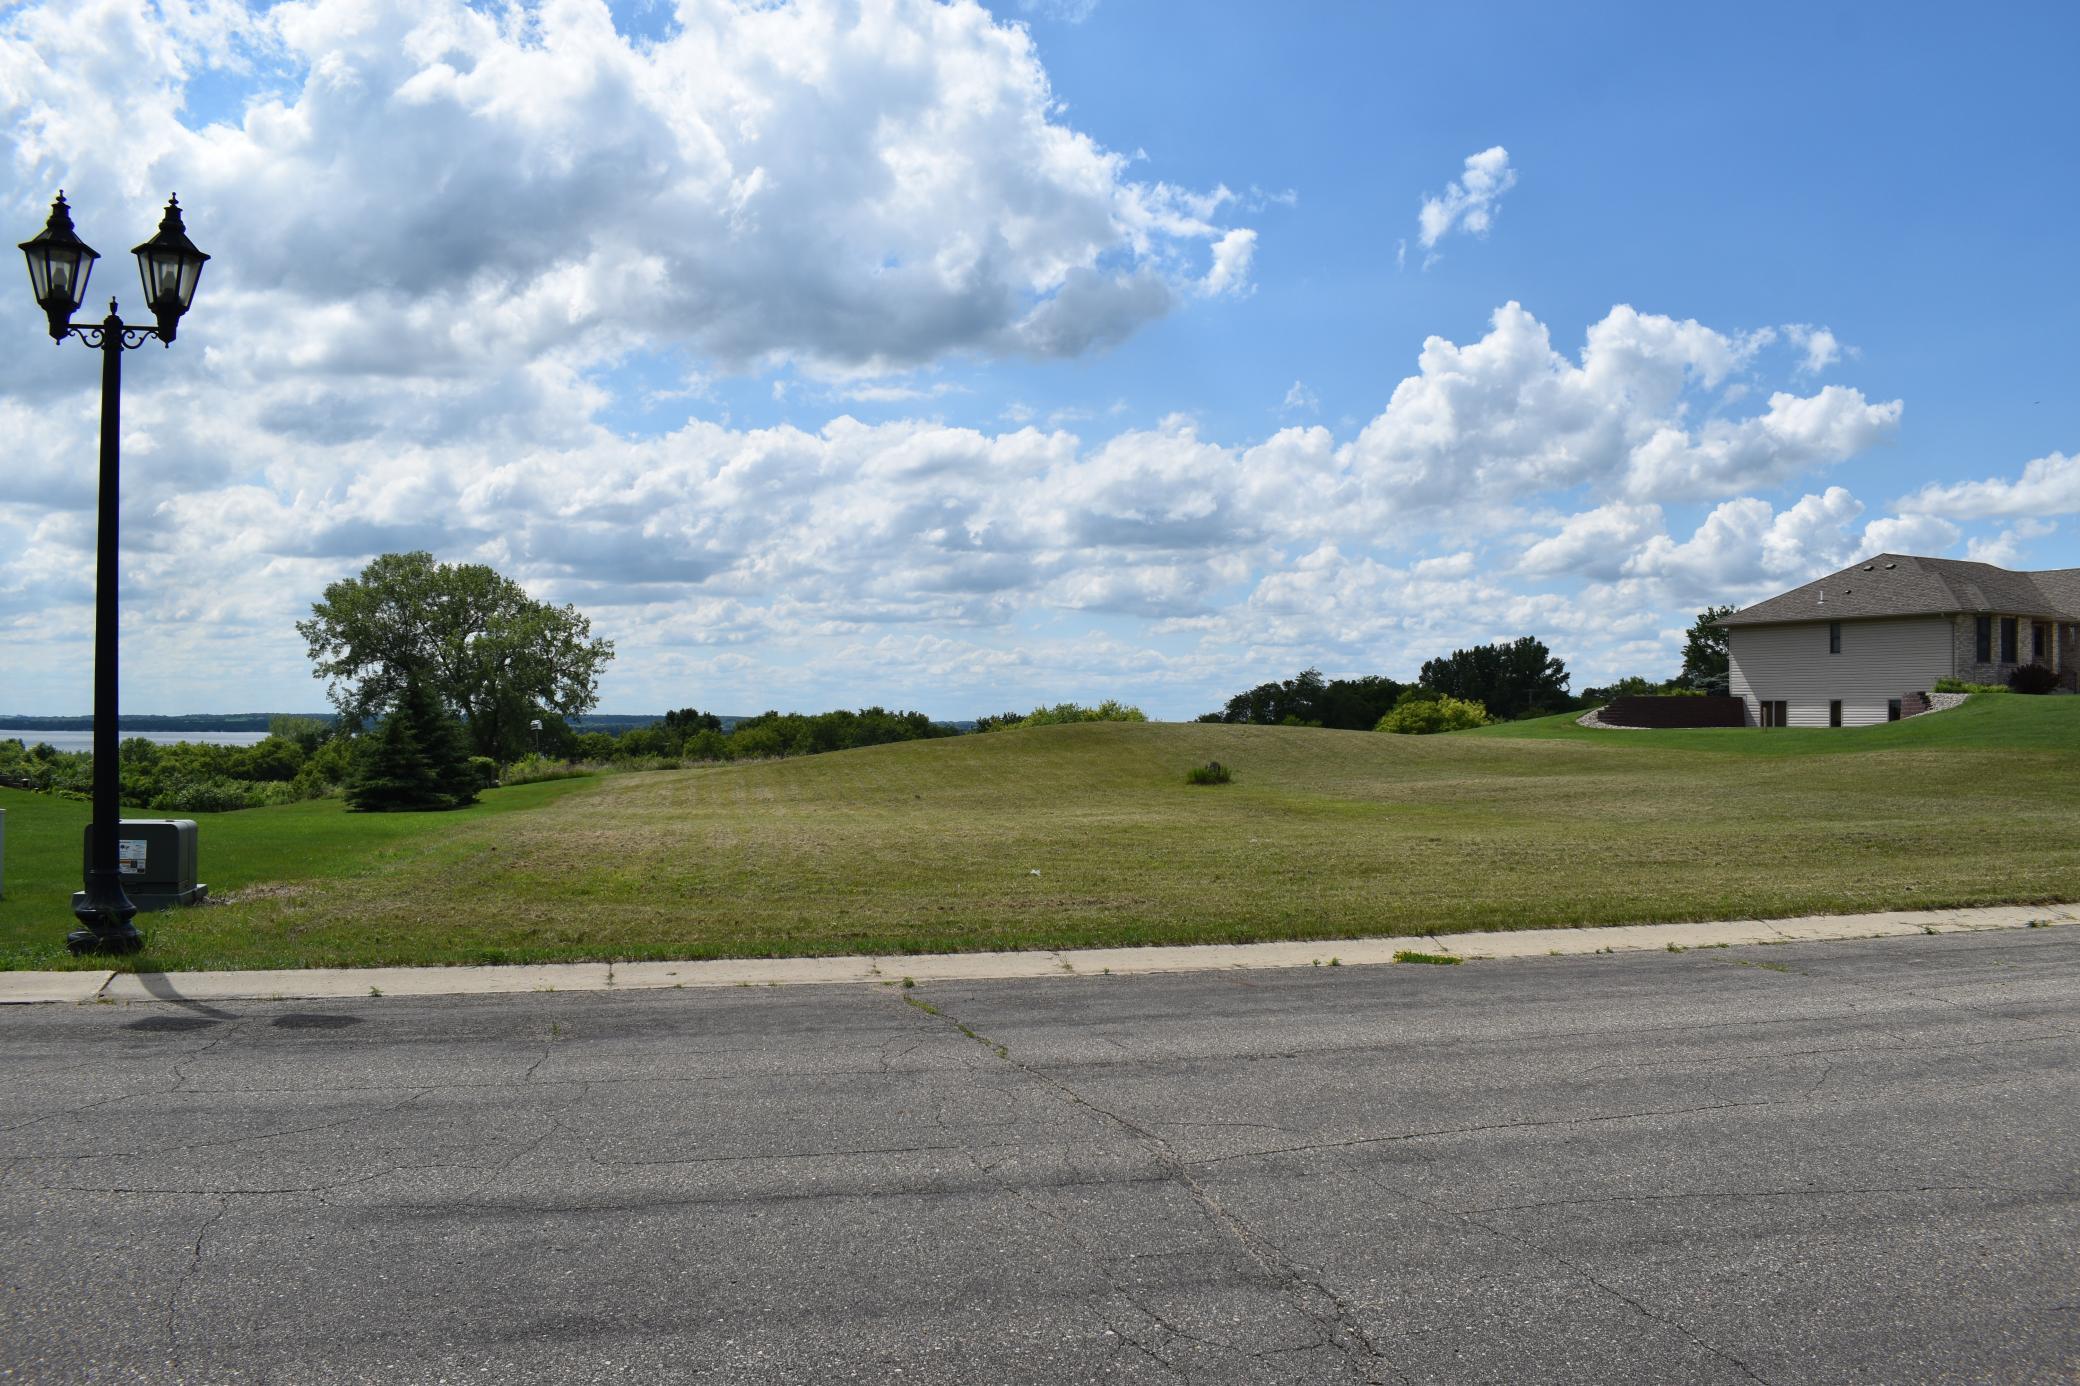 541 Depree Way Property Photo - Glenwood, MN real estate listing